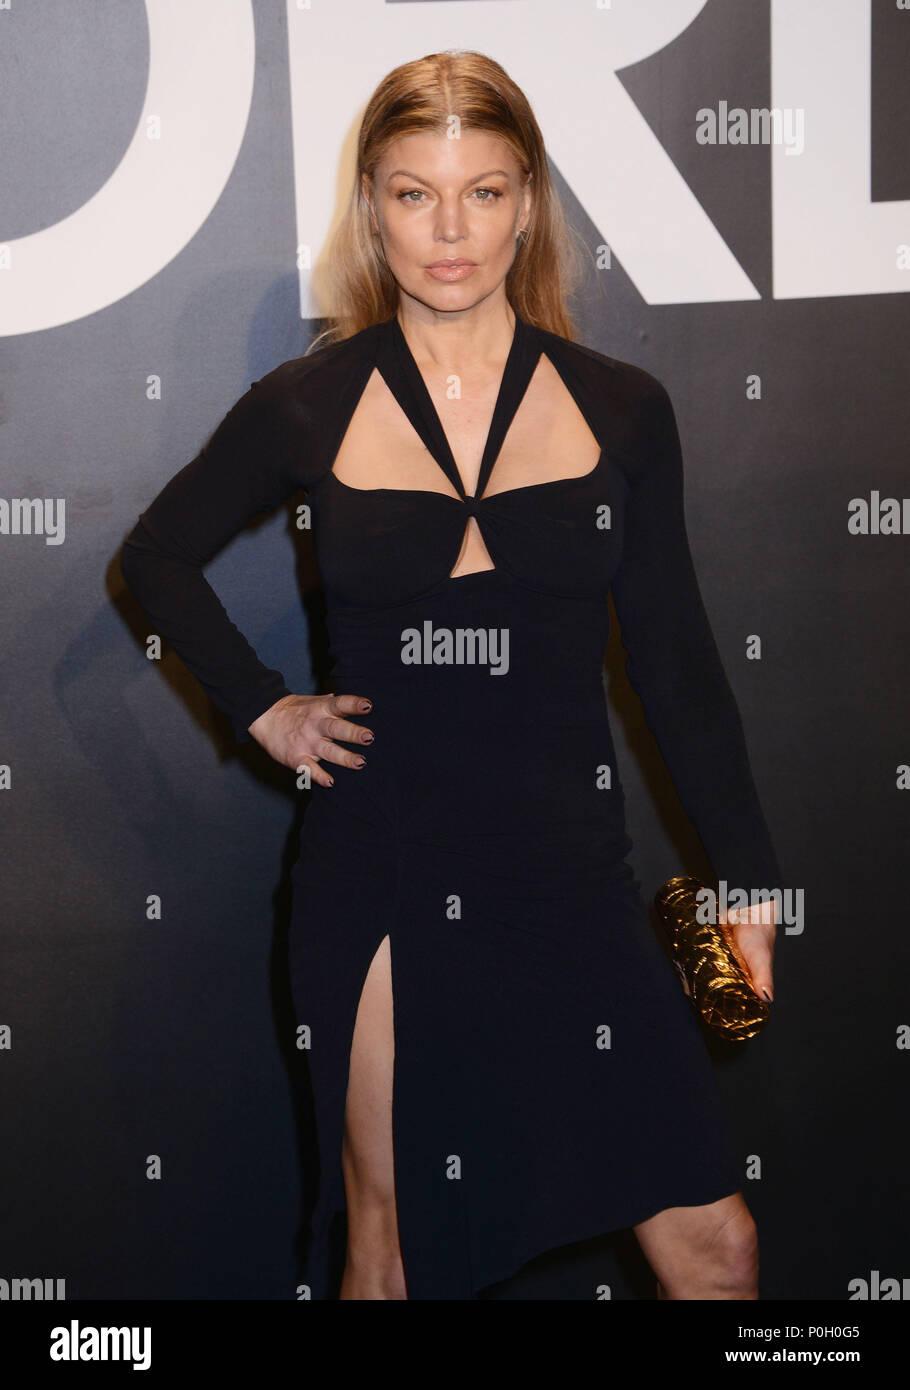 Celebrites Sarah Ferguson nudes (14 photo), Pussy, Hot, Instagram, swimsuit 2018